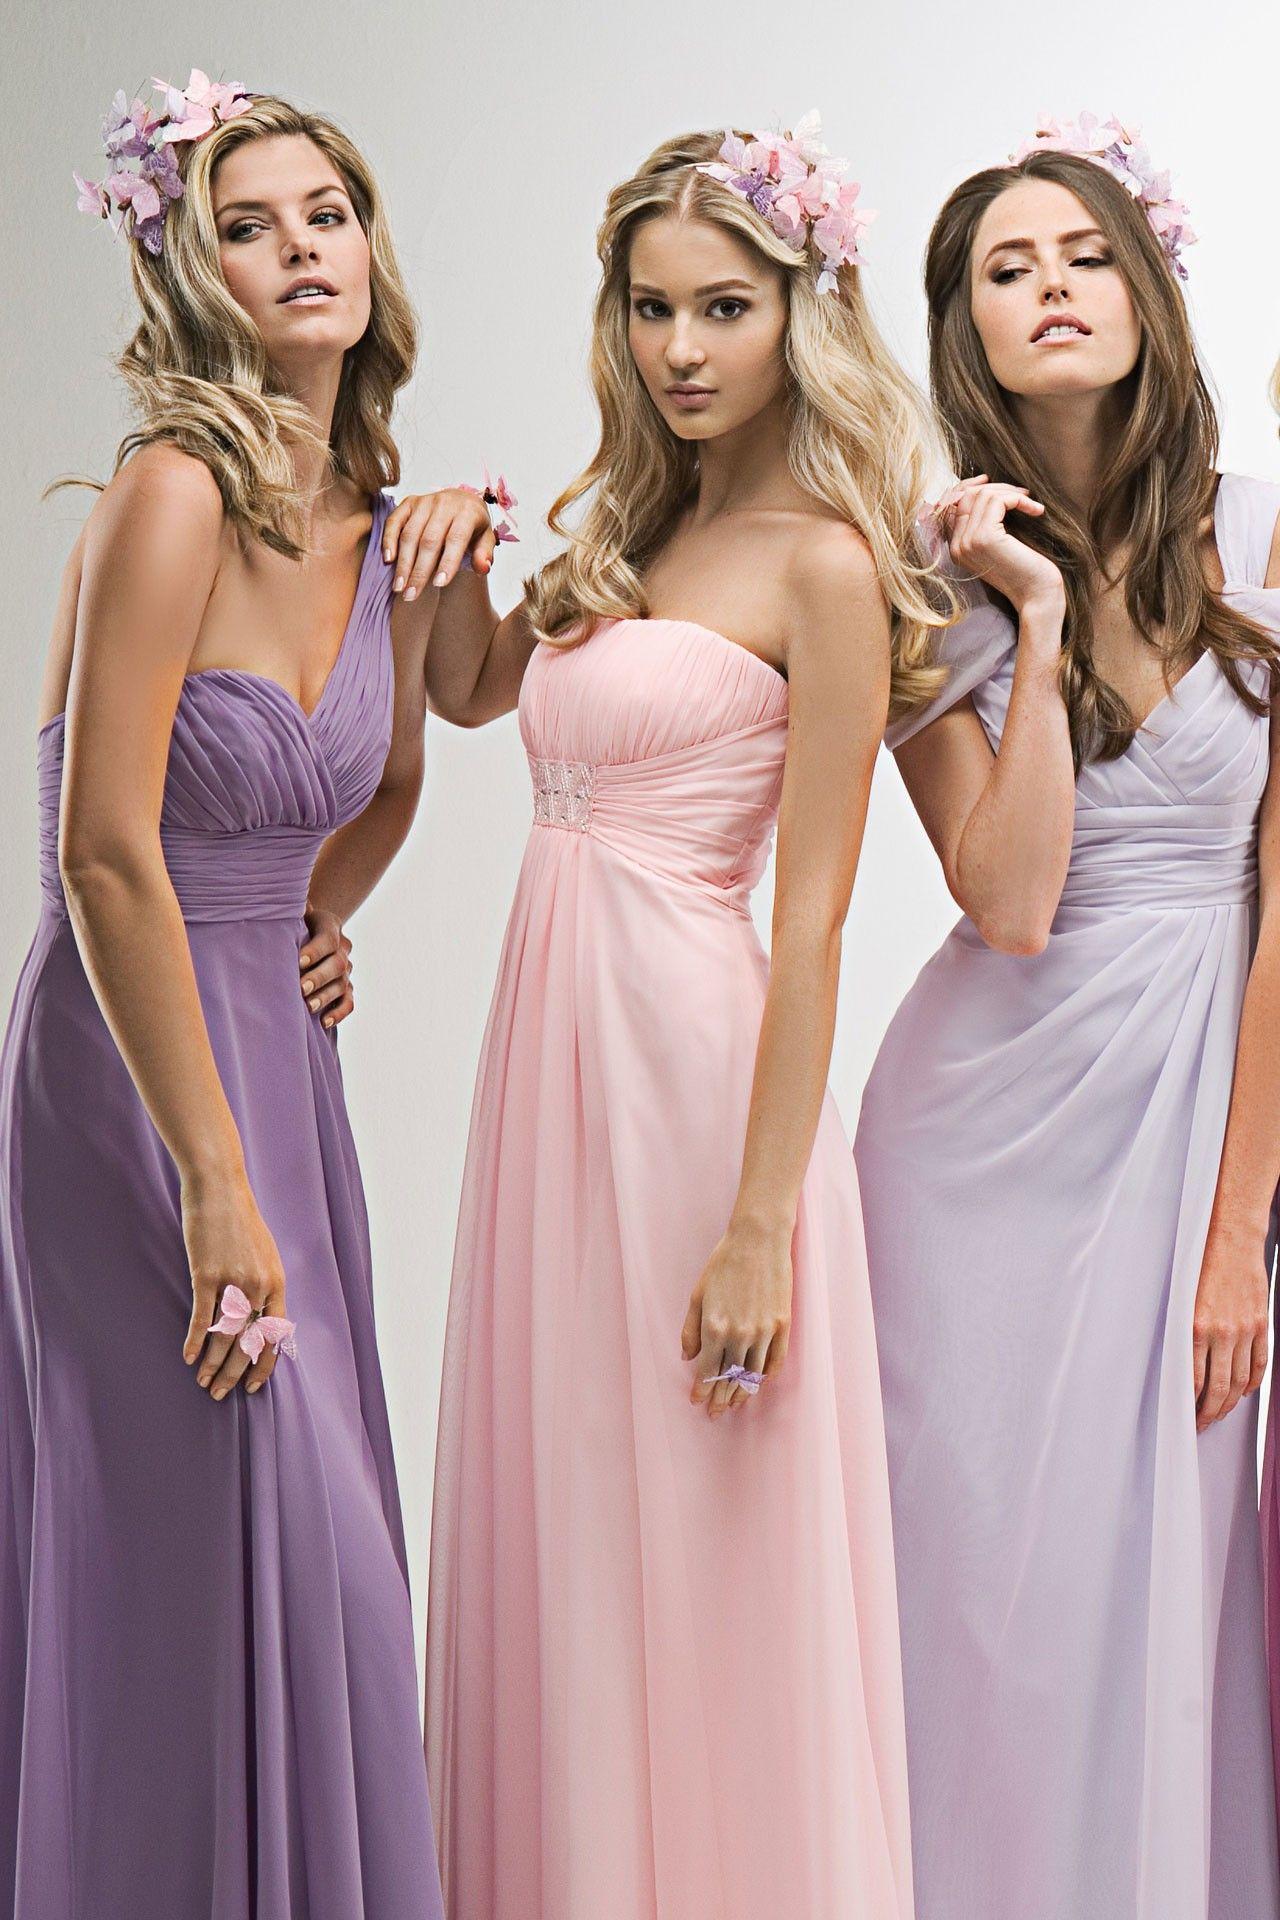 Bridesmaid dresses latest styles ideas bridesmagazine bridesmaid dresses latest styles ideas bridesmagazine ombrellifo Images